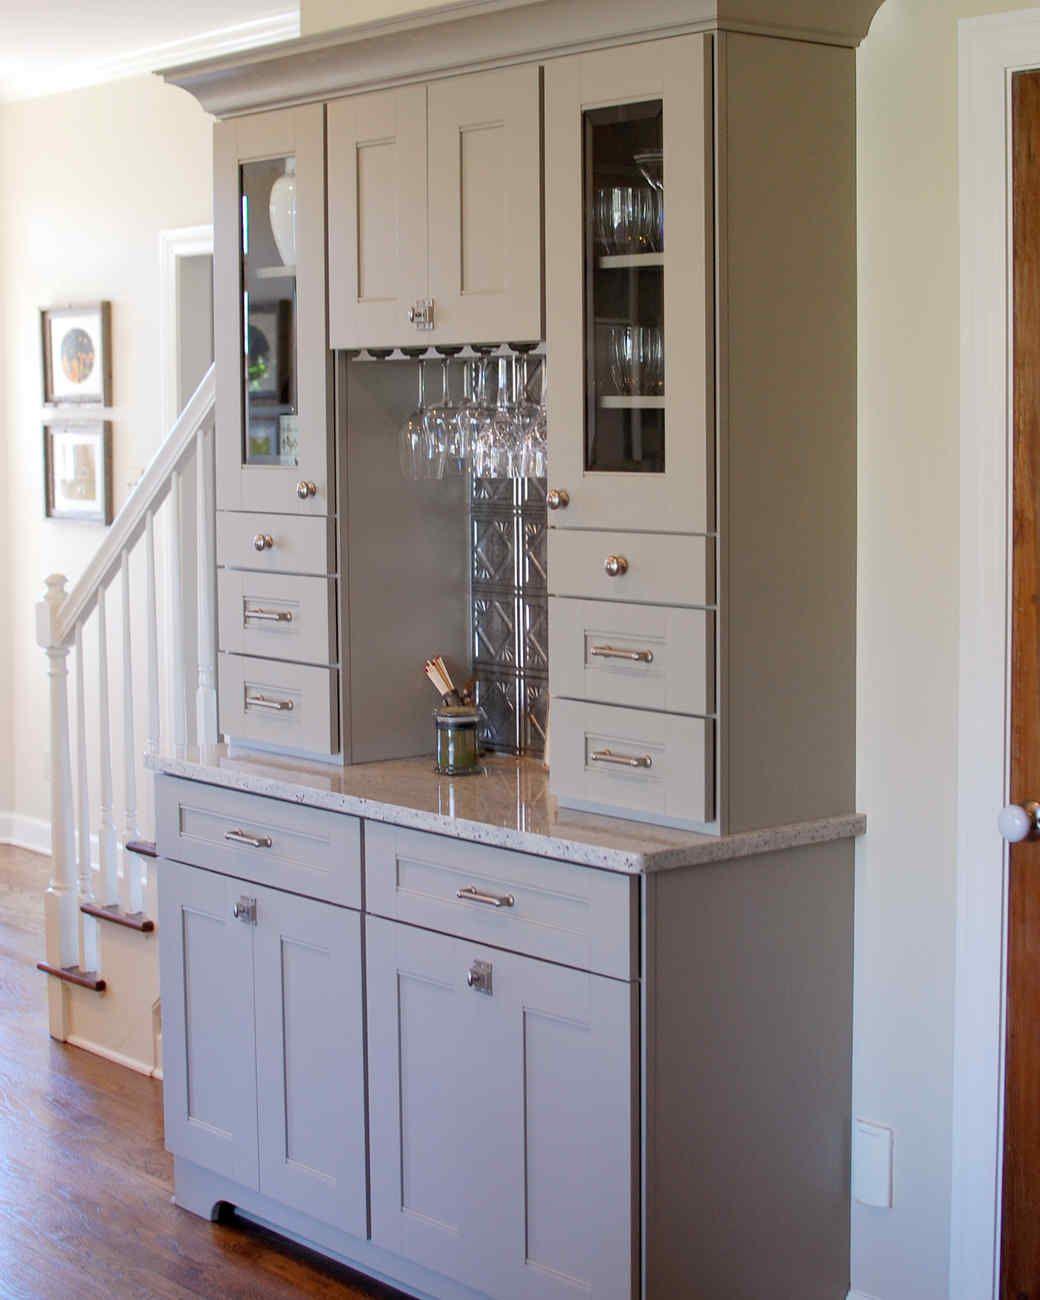 20 Beautiful Functional Kitchens To Inspire Your Own Martha Stewart Living Kitchen Home Decor Kitchen Home Depot Kitchen